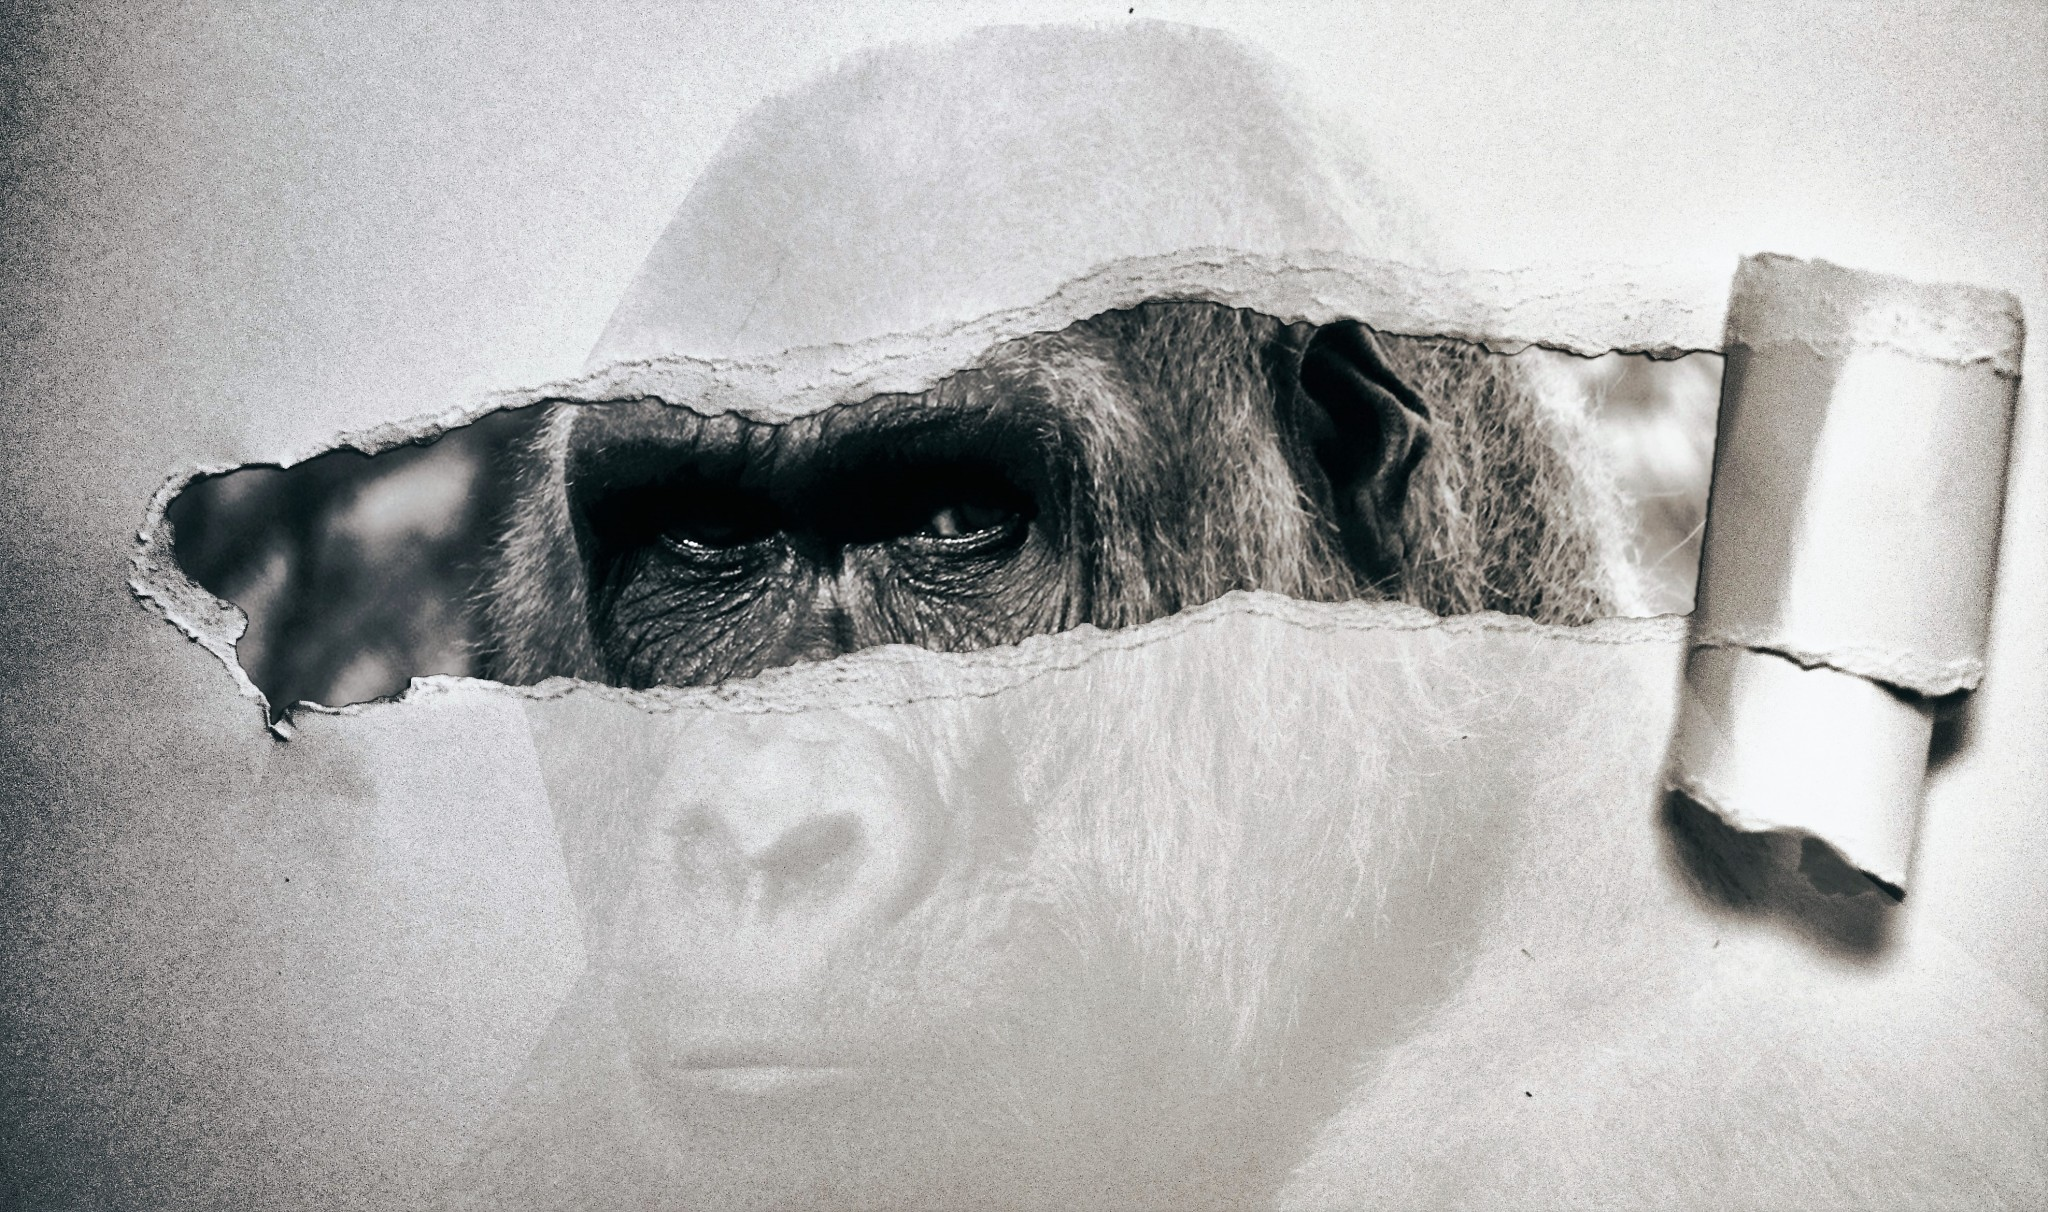 gorilla-2654323_PX - kopie